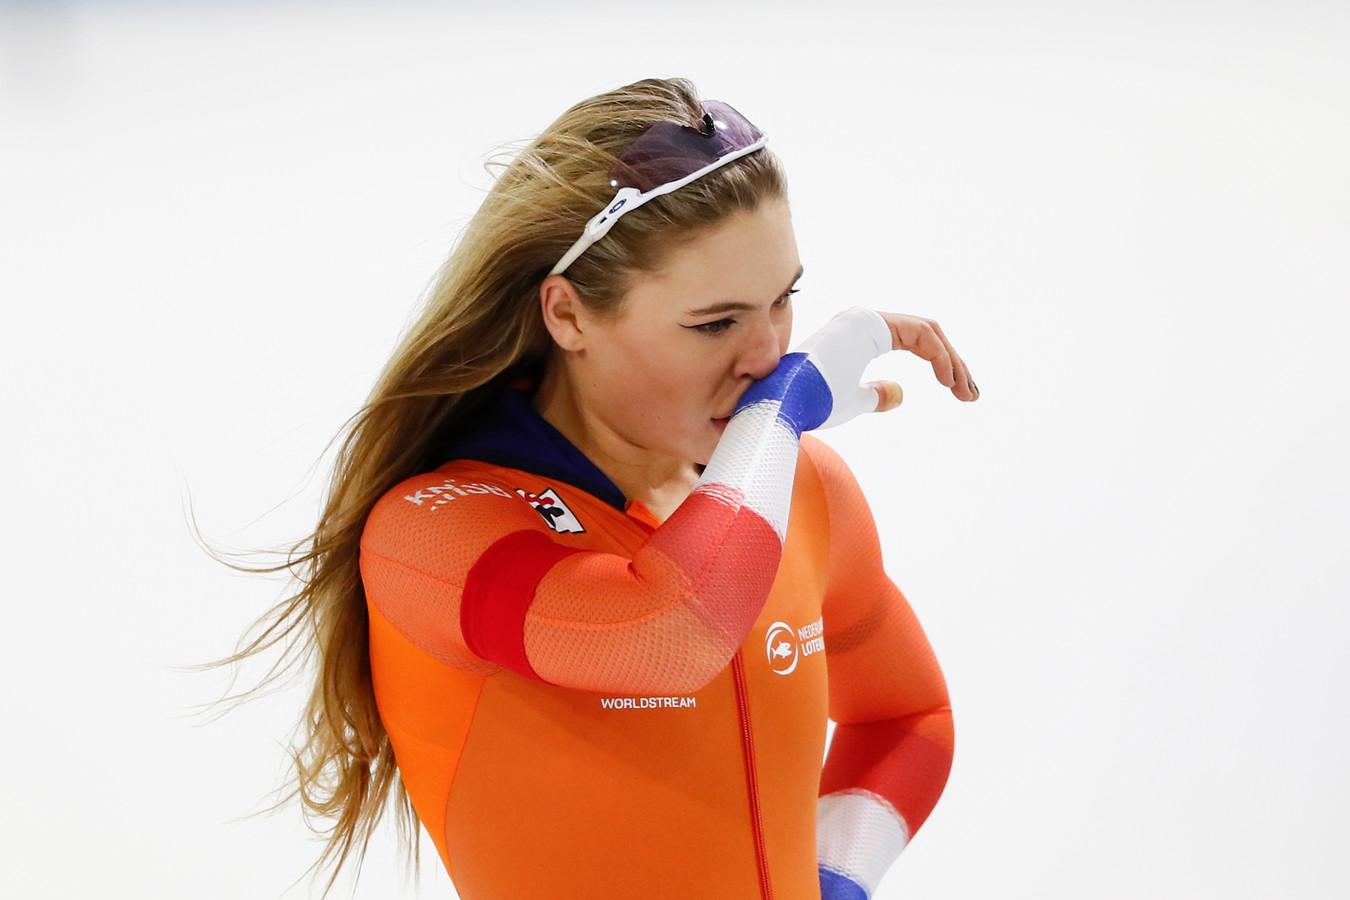 Jutta Leerdam is teleurgesteld over haar 500 meter.